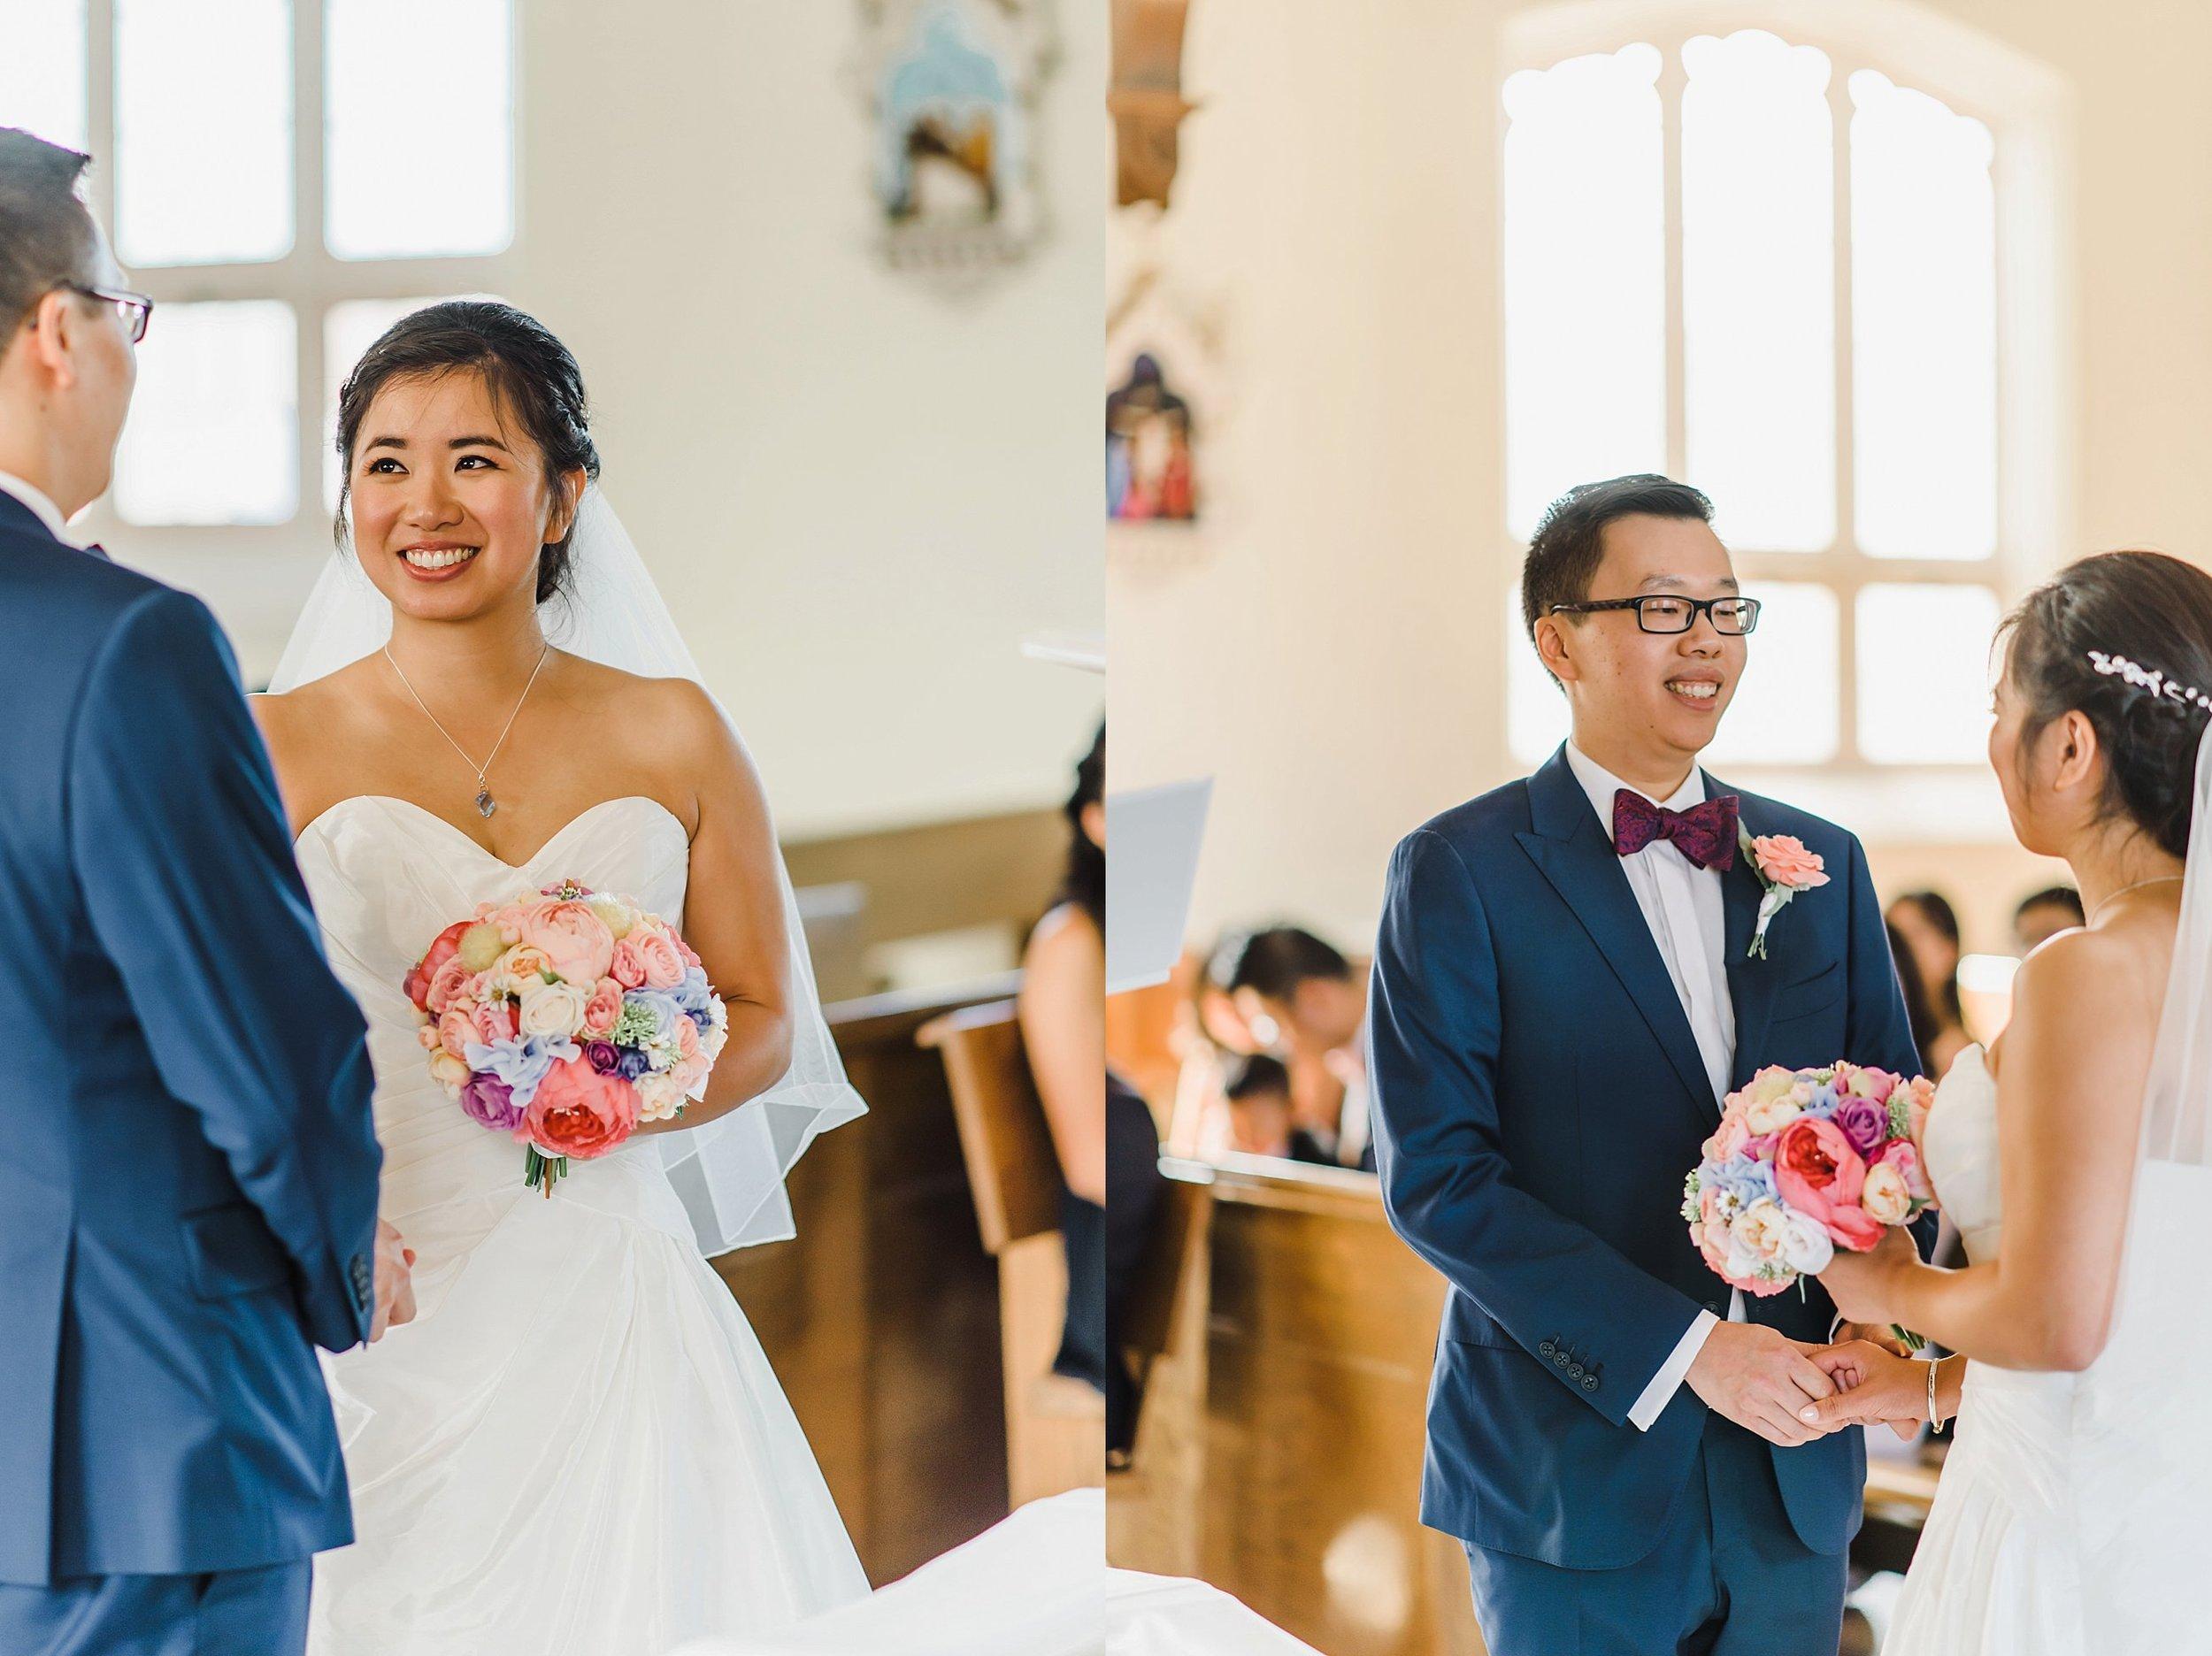 light airy indie fine art ottawa wedding photographer | Ali and Batoul Photography_1490.jpg